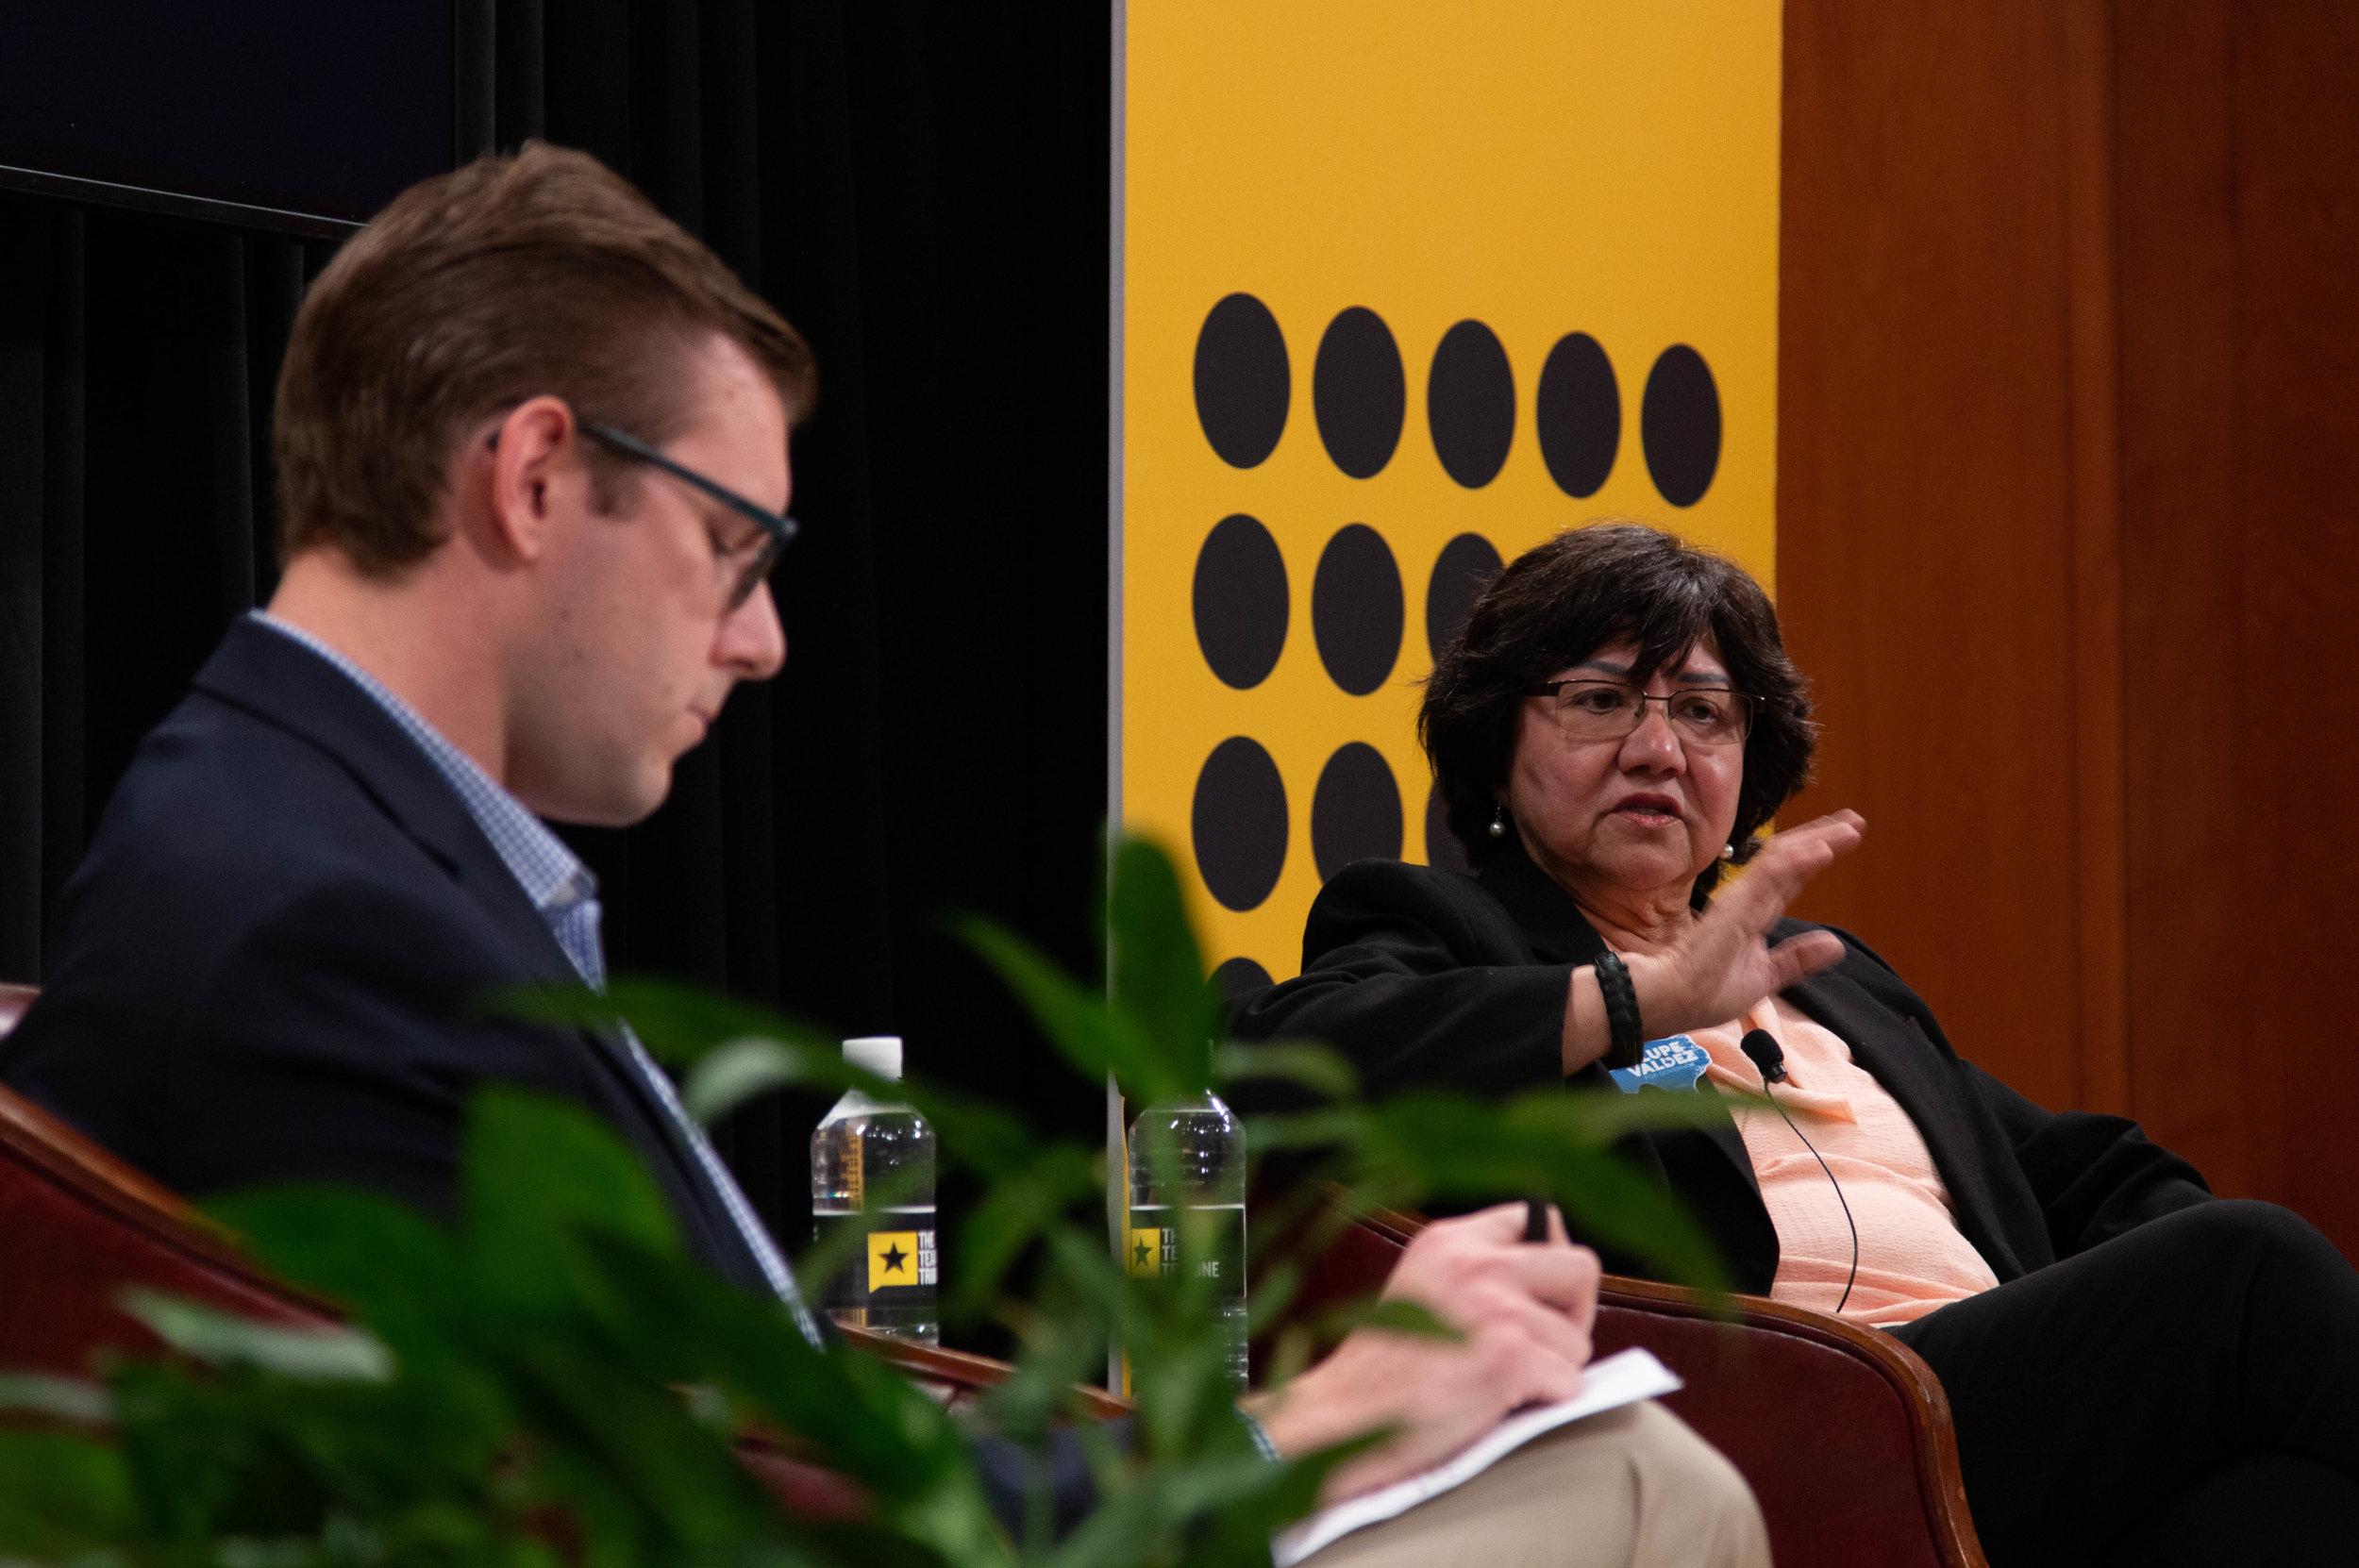 Texas Tribune journalist Patrick Svitek moderated a one-on-one with Democratic gubernatorial nominee Lupe Valdez.